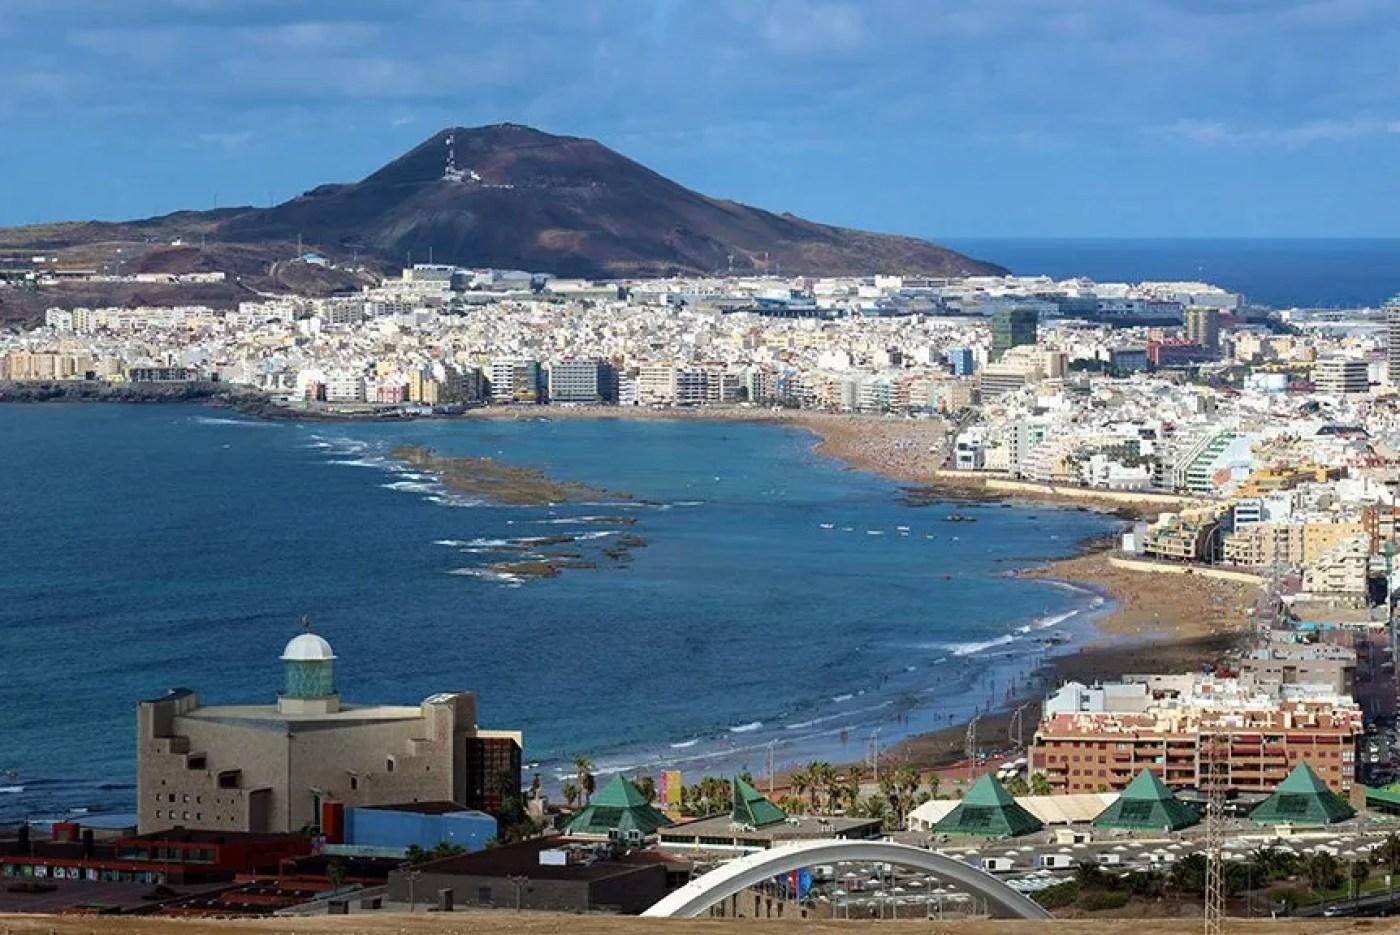 Canary Islands city